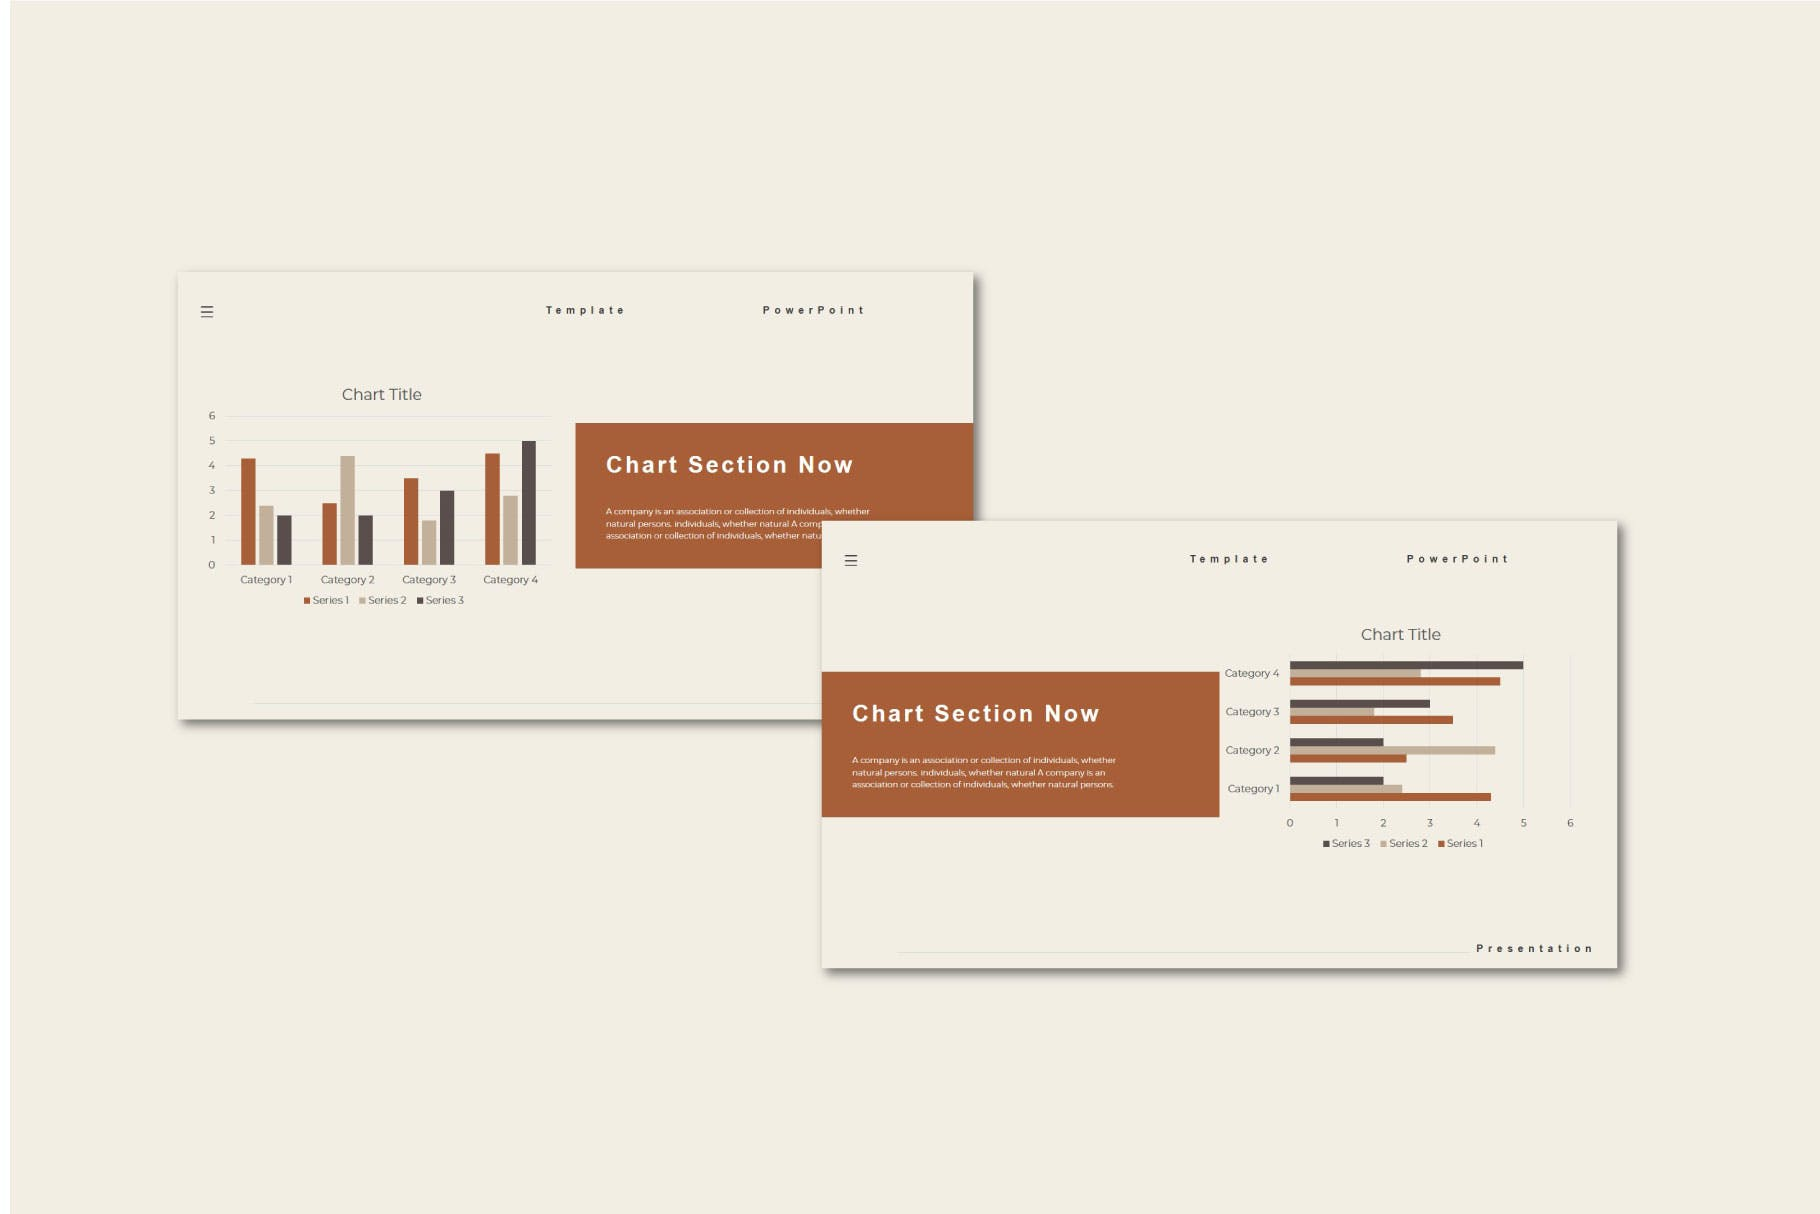 PPT幻灯片时尚服装设计模板 Lovita – Powerpoint Template设计素材模板